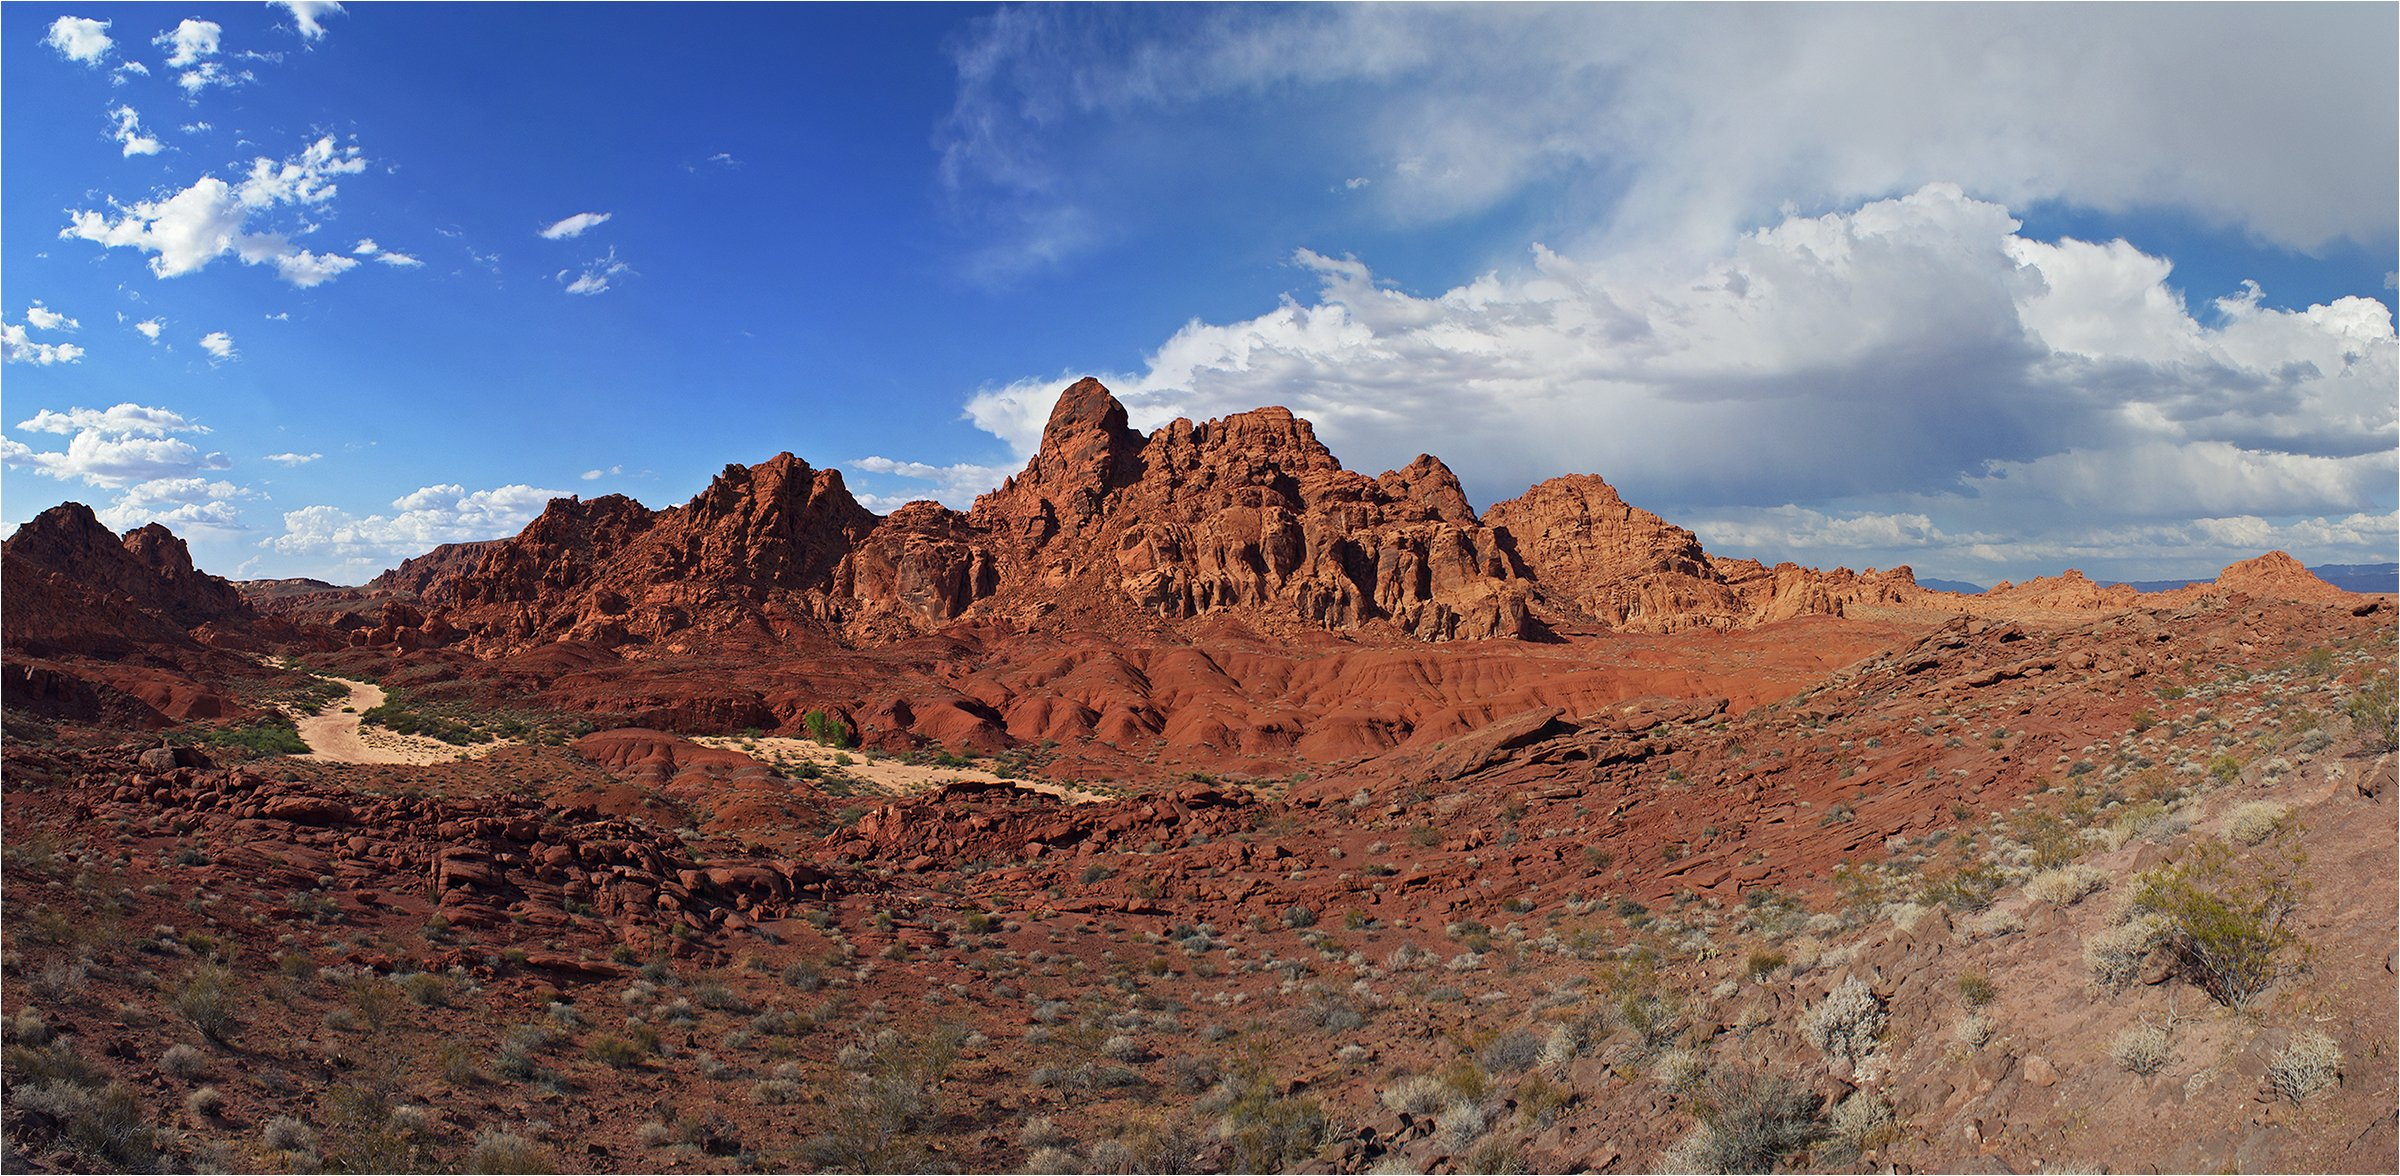 Nevada, Usa, Valley of fire, Долина огня, Невада, Сша, Владимир В. Эделев